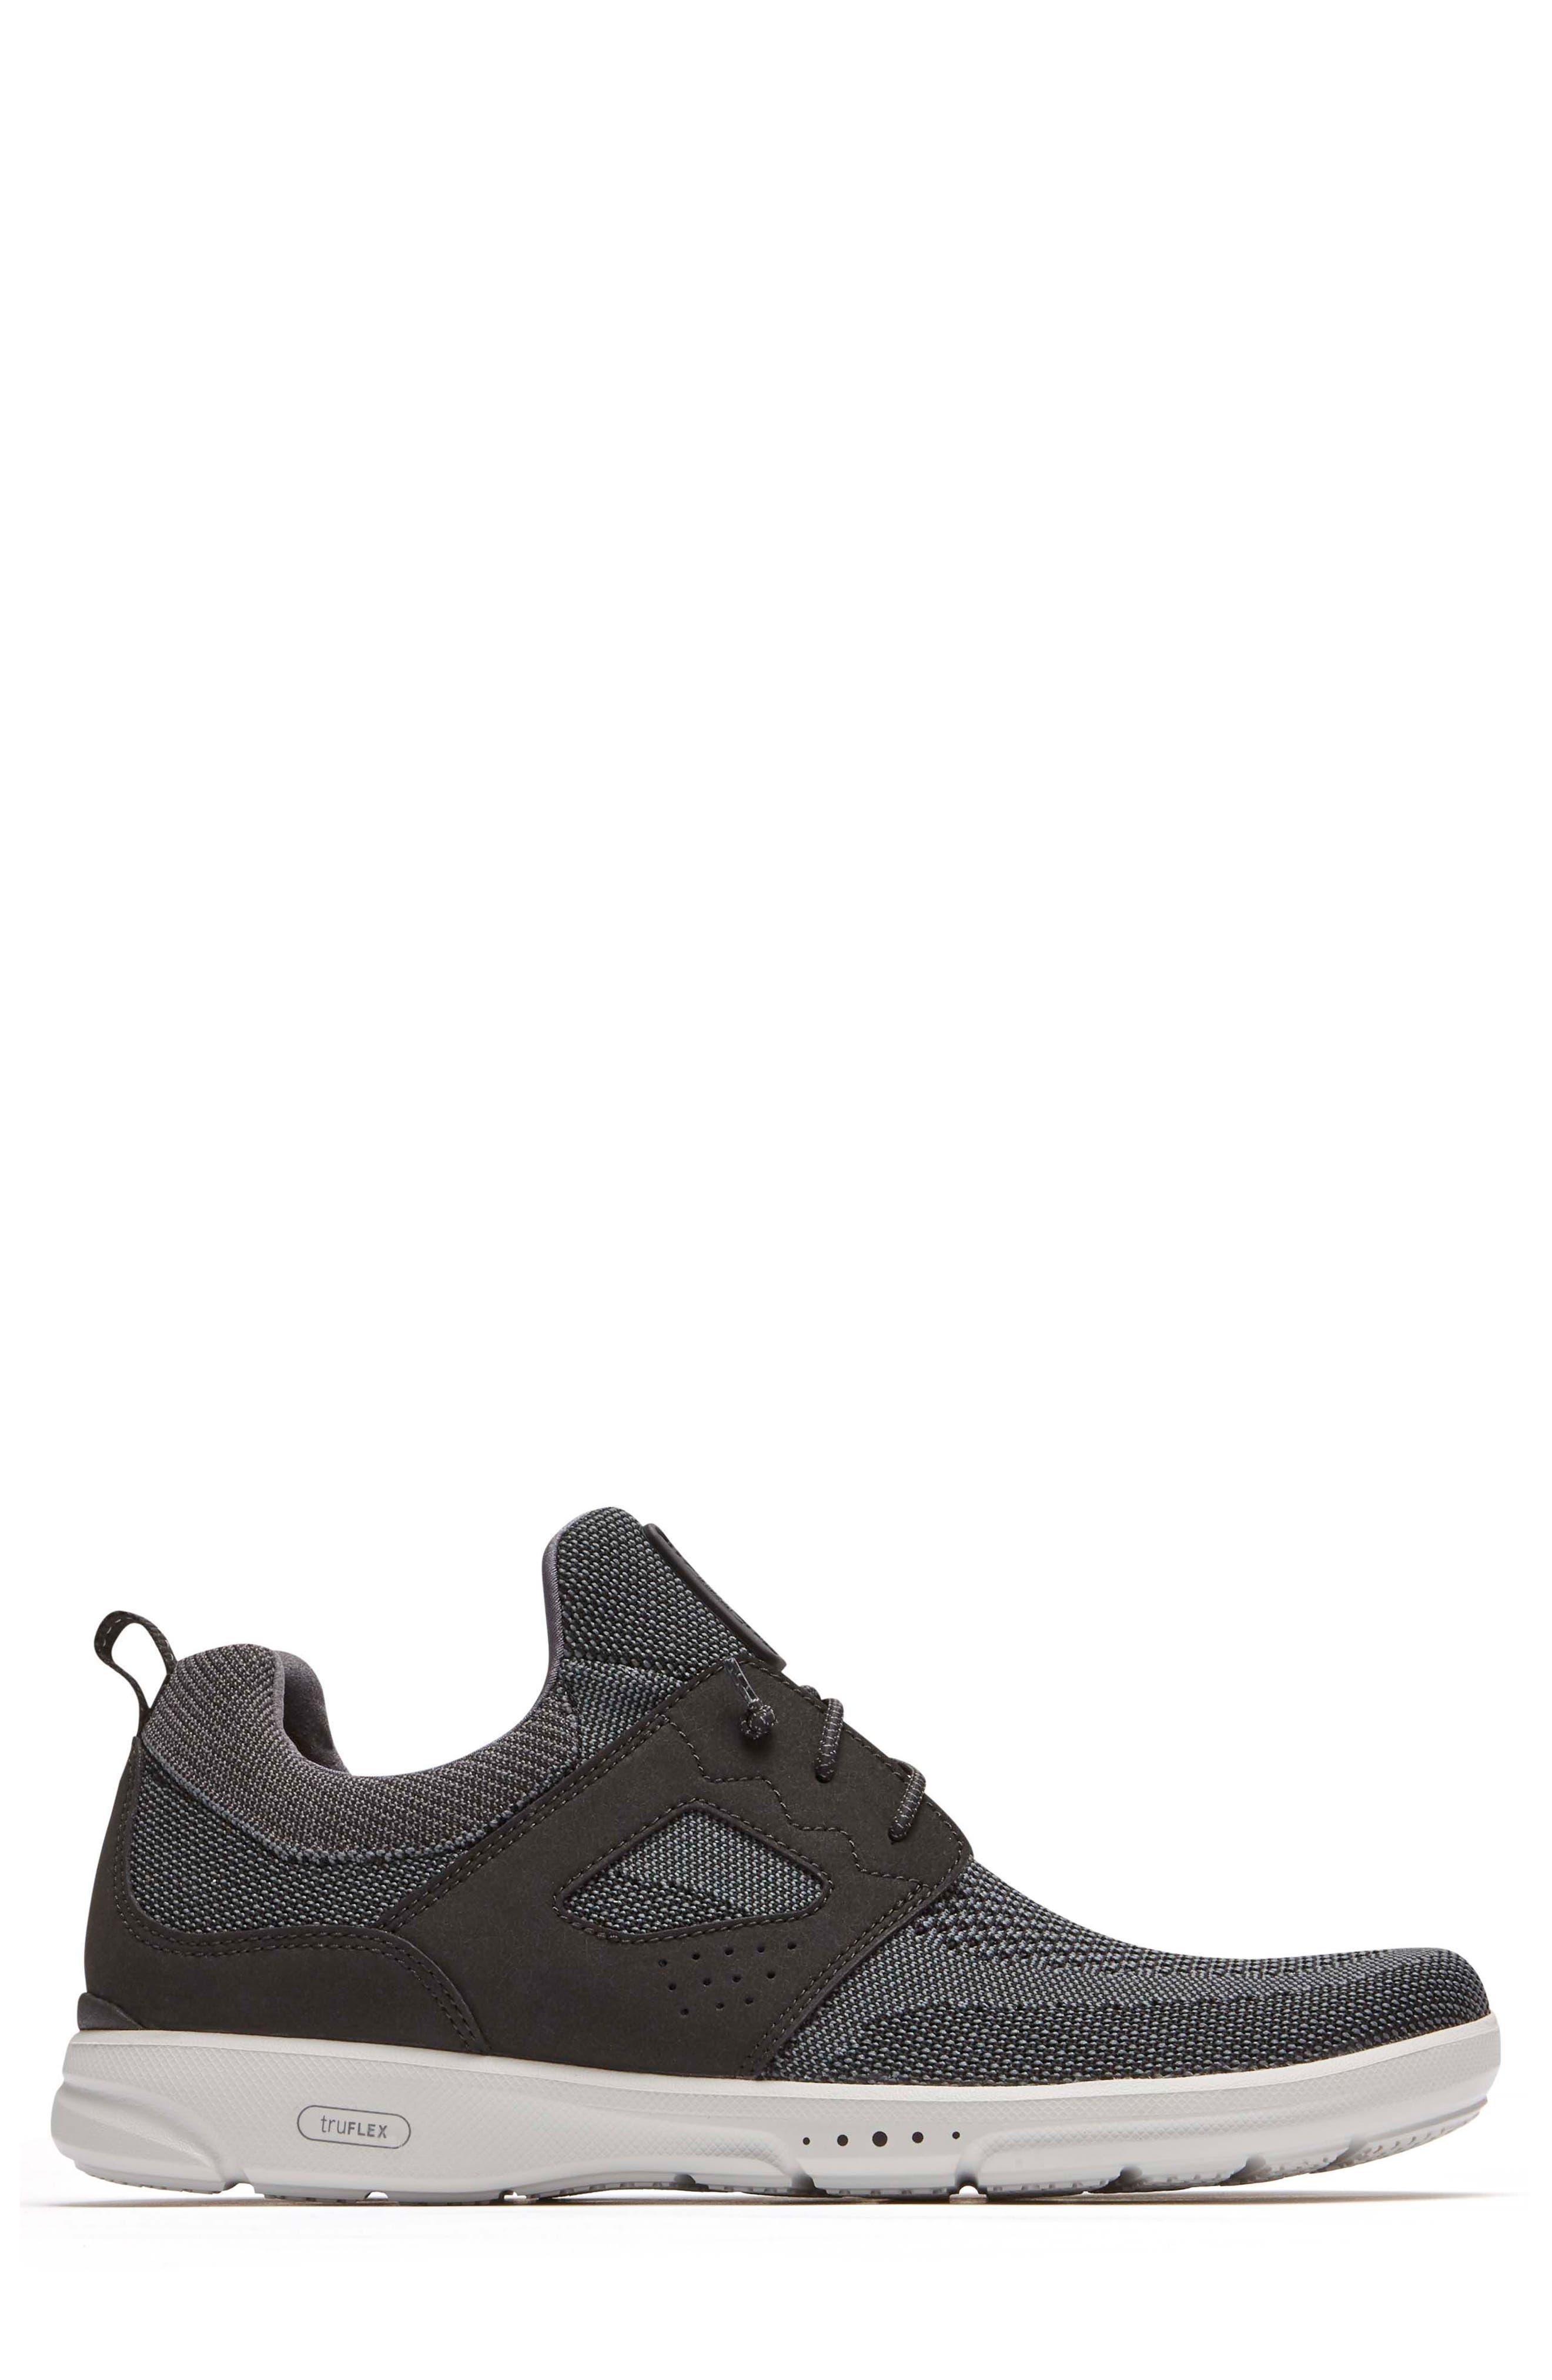 truFlex Sneaker,                             Alternate thumbnail 3, color,                             001